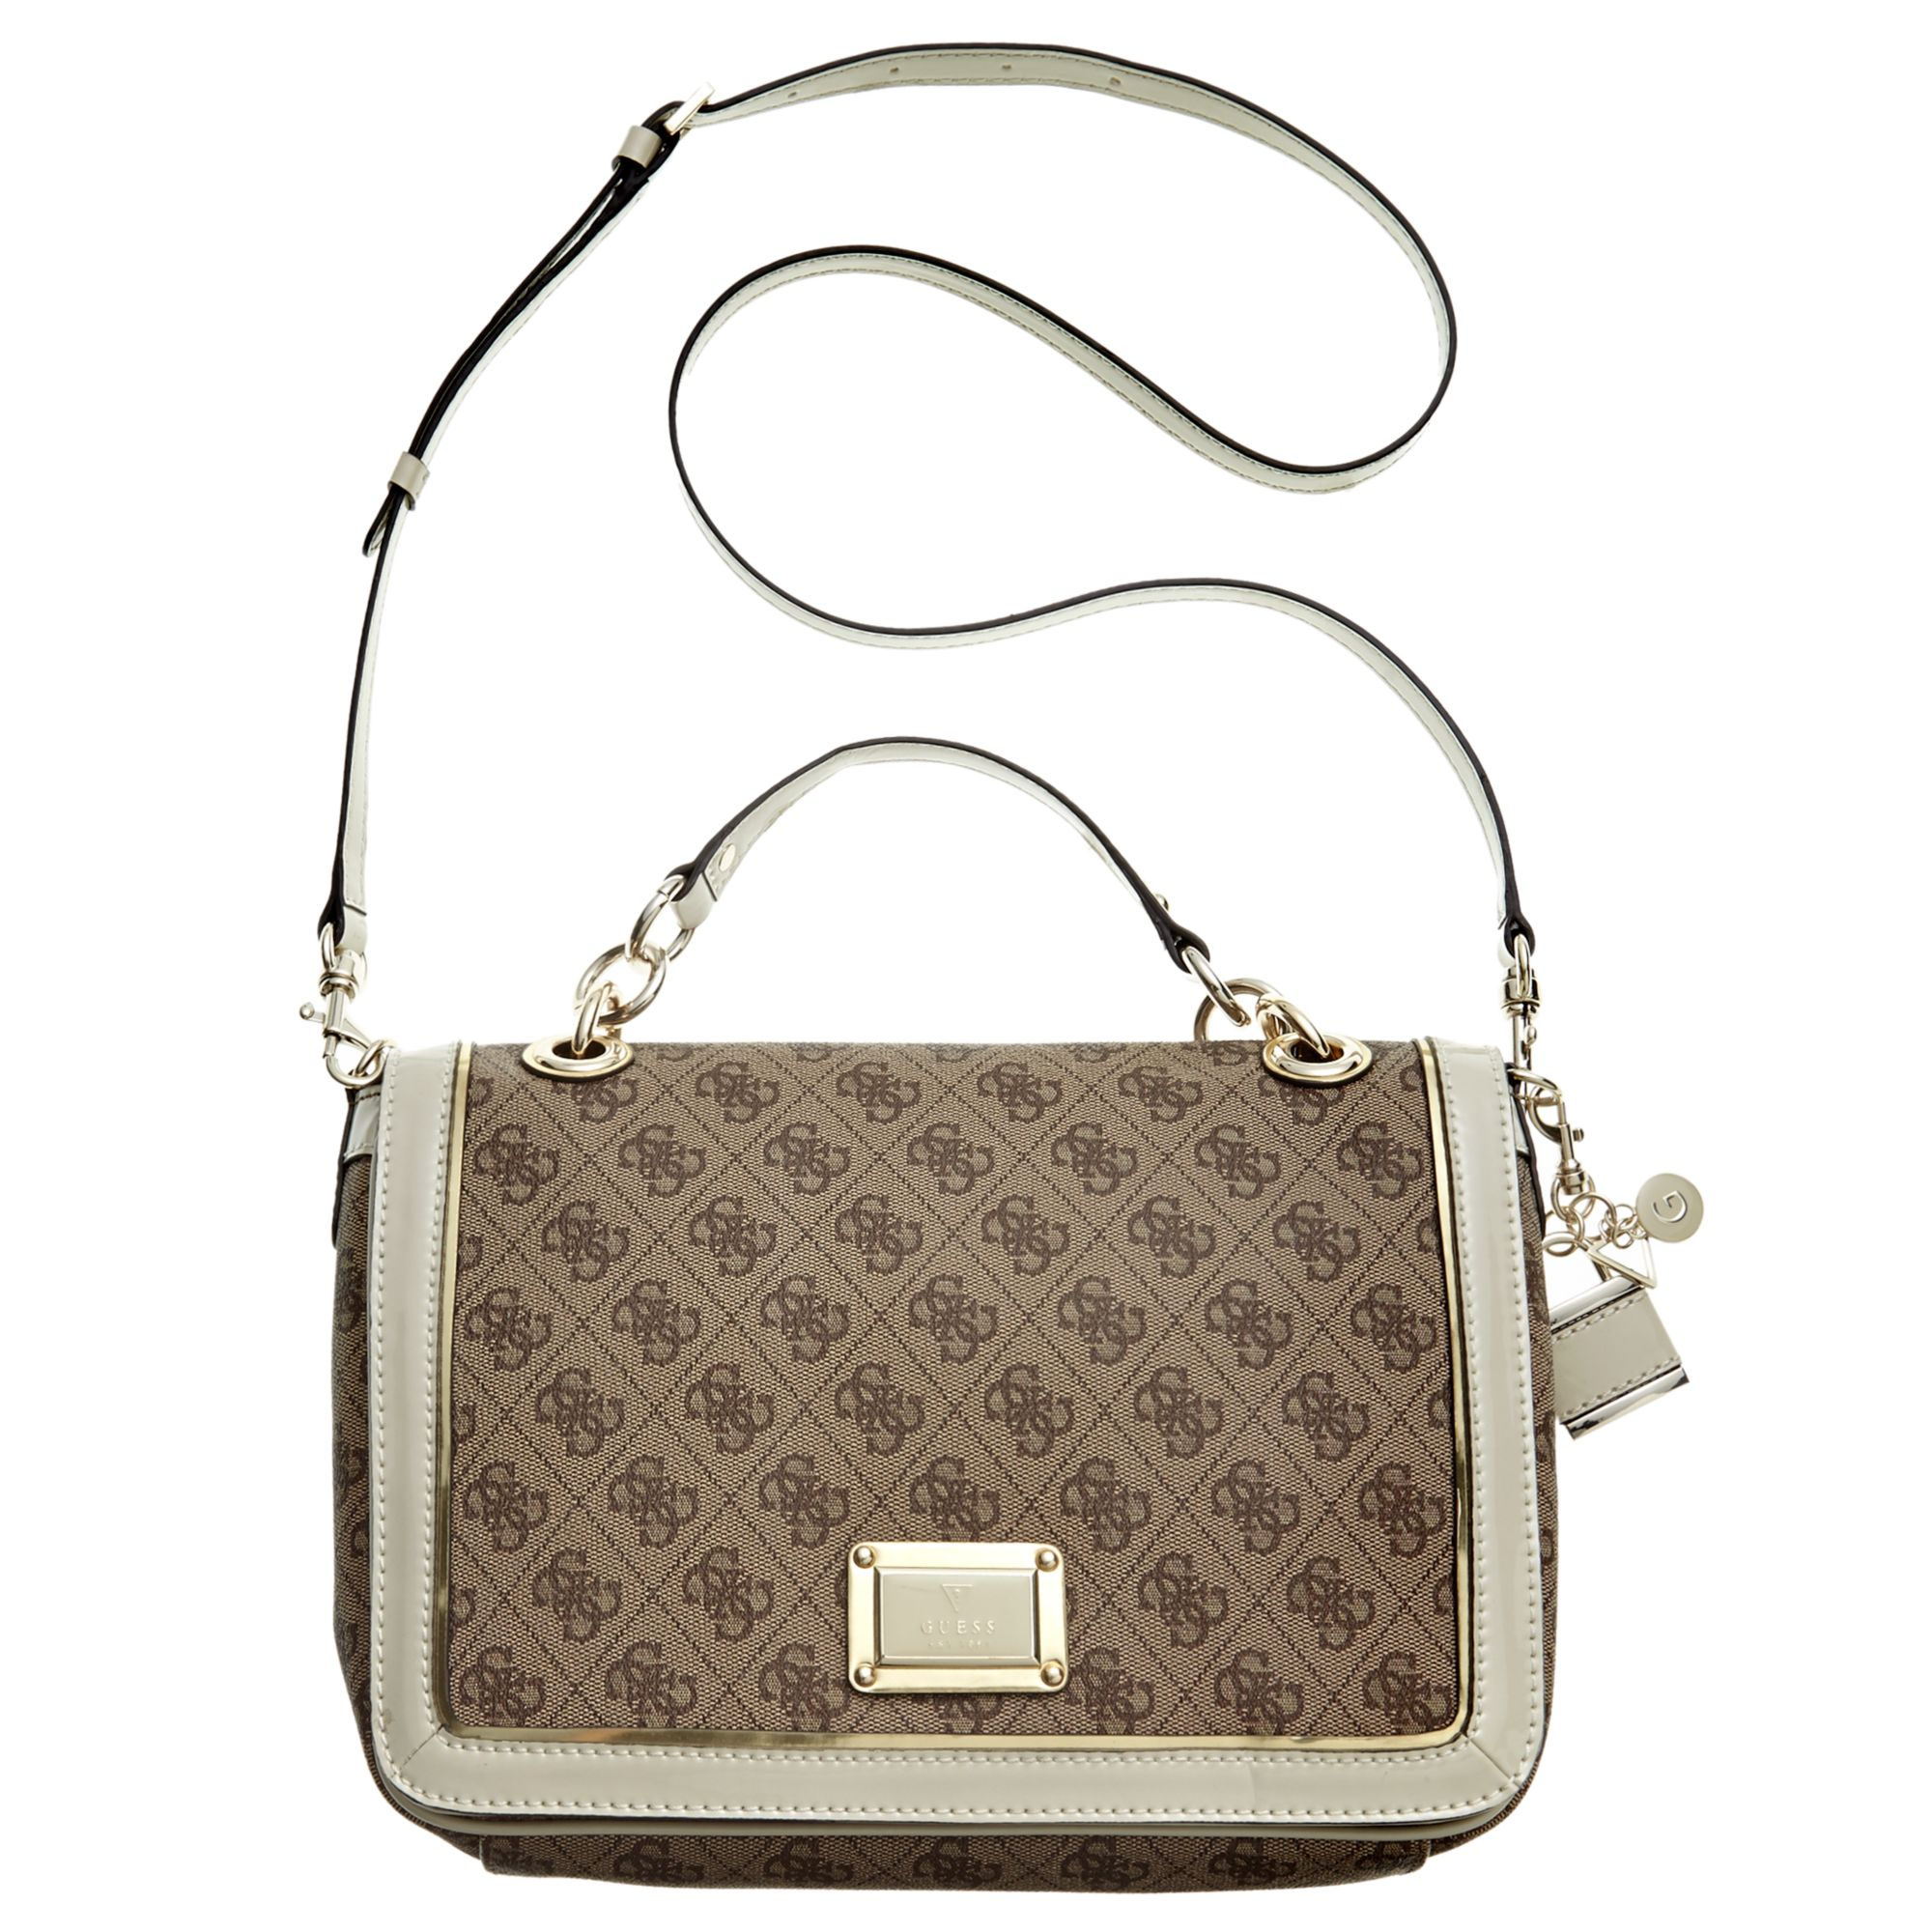 Guess Guess Handbag Reama Top Handle Flap Shoulder Bag In White Vanilla Lyst